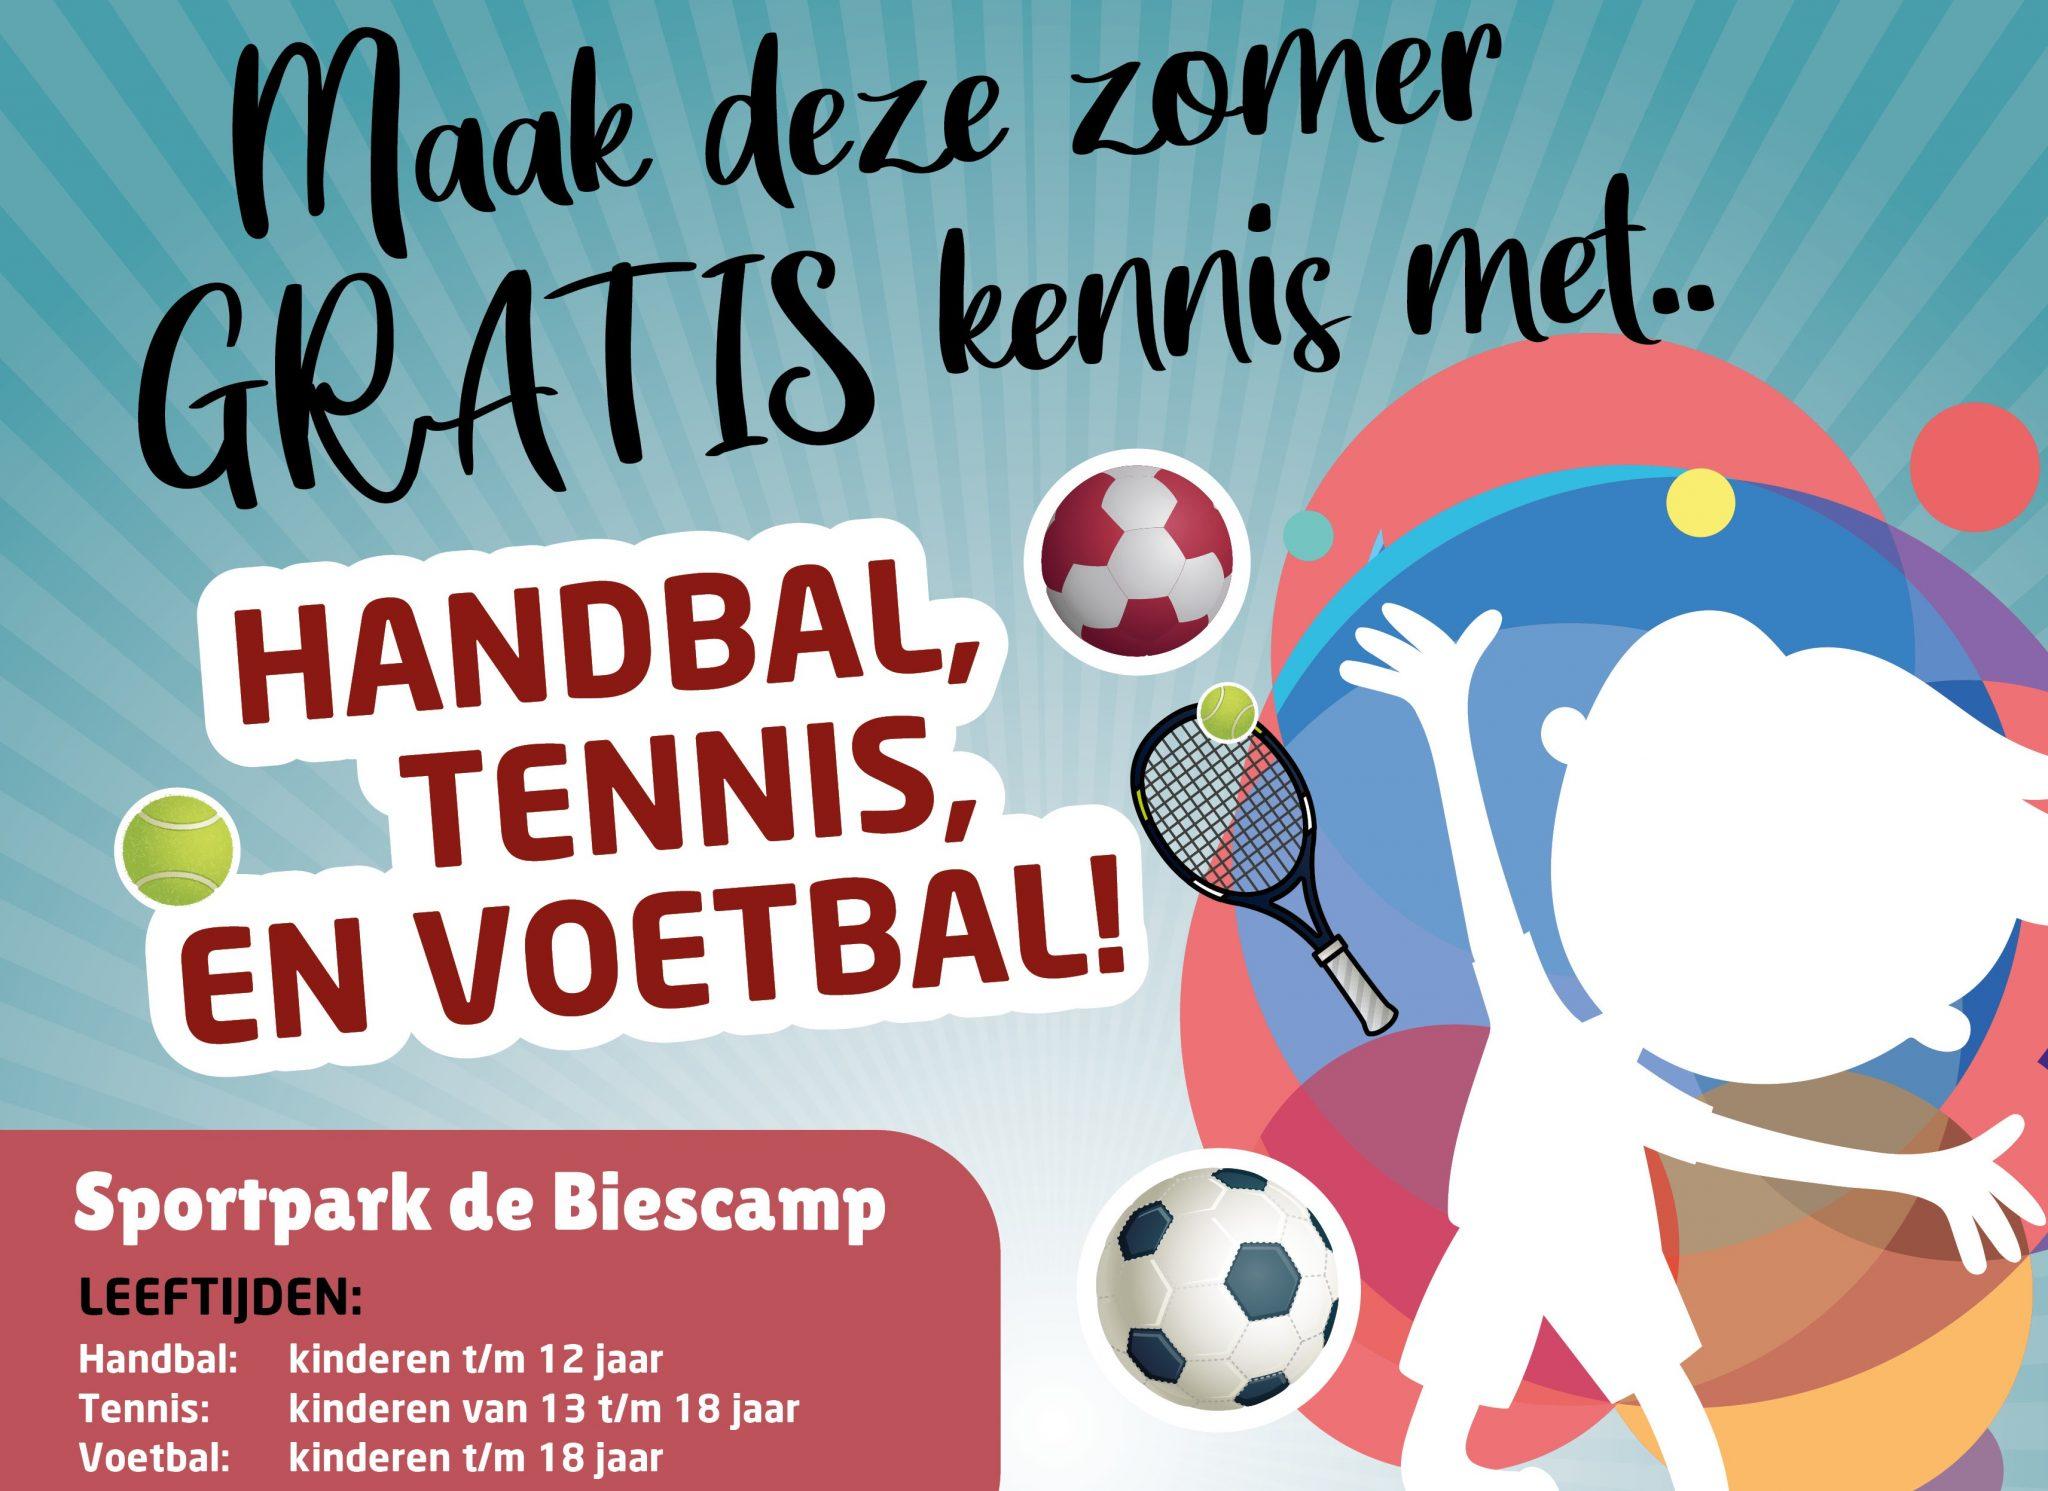 Maak eens kennis met handbal en tennis!